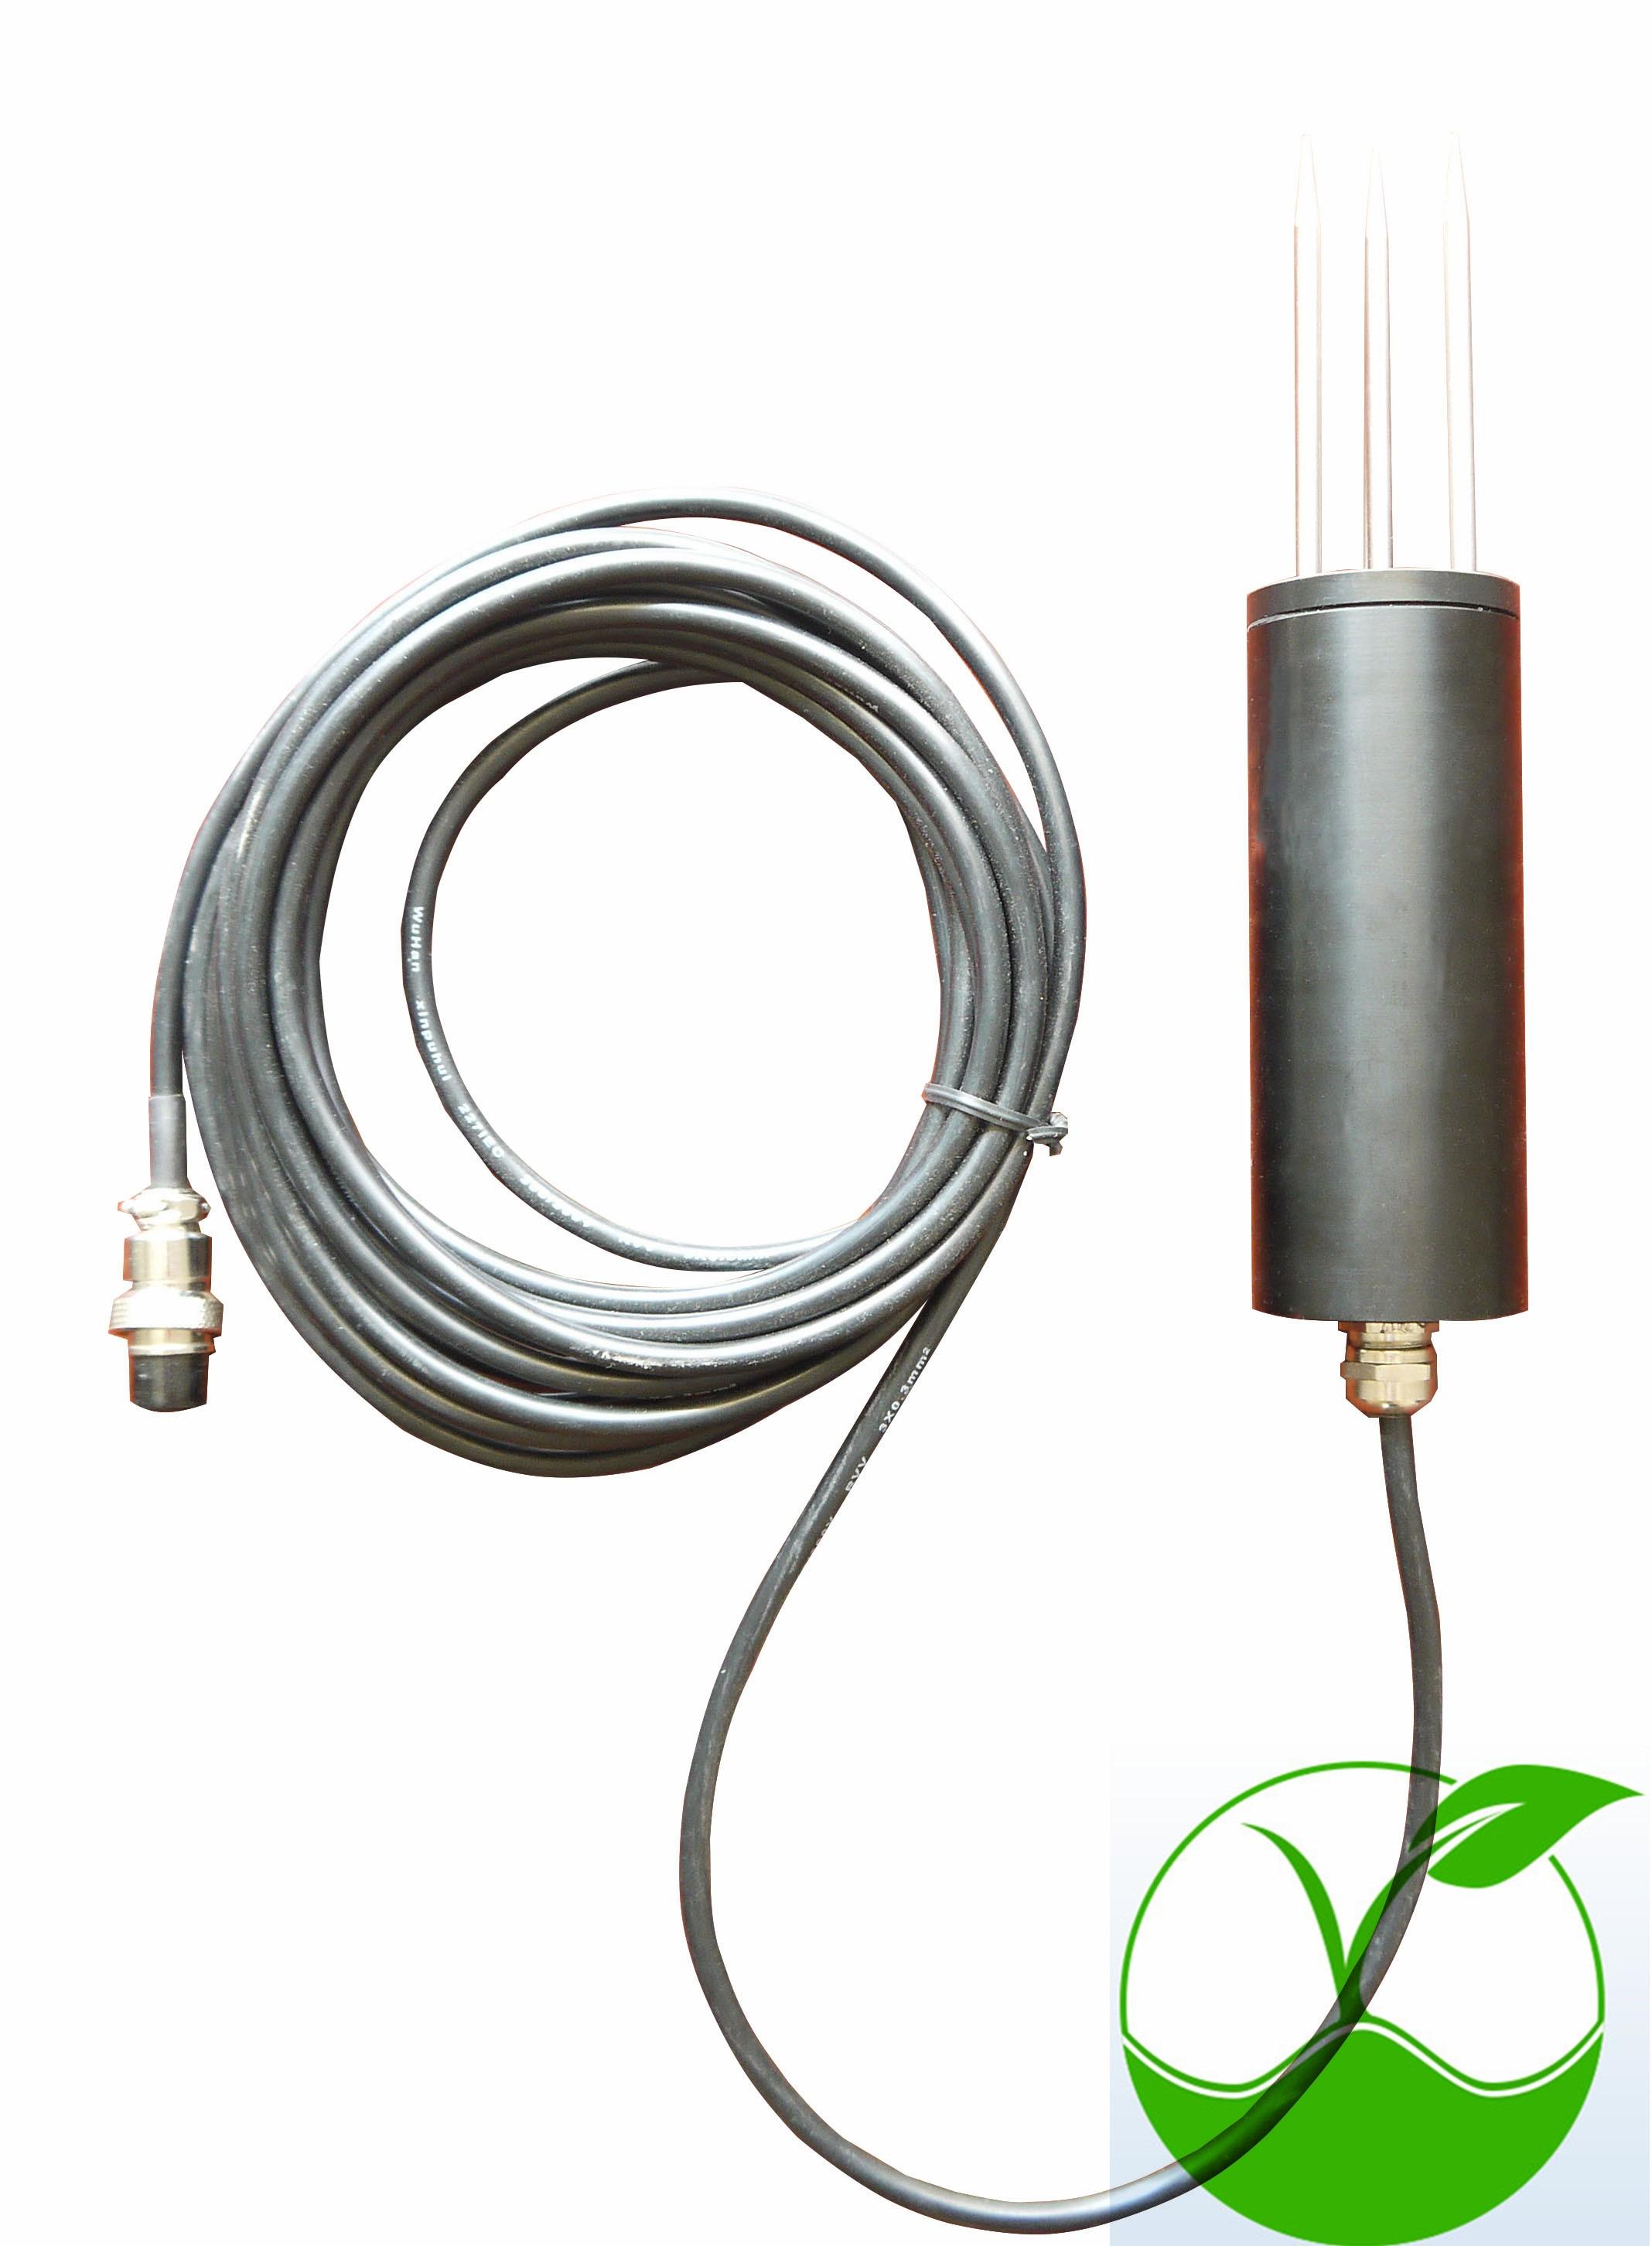 Soil moisture sensor / moisture content / moisture content (RS485 / 232,4 20mA / 0 2.5V)